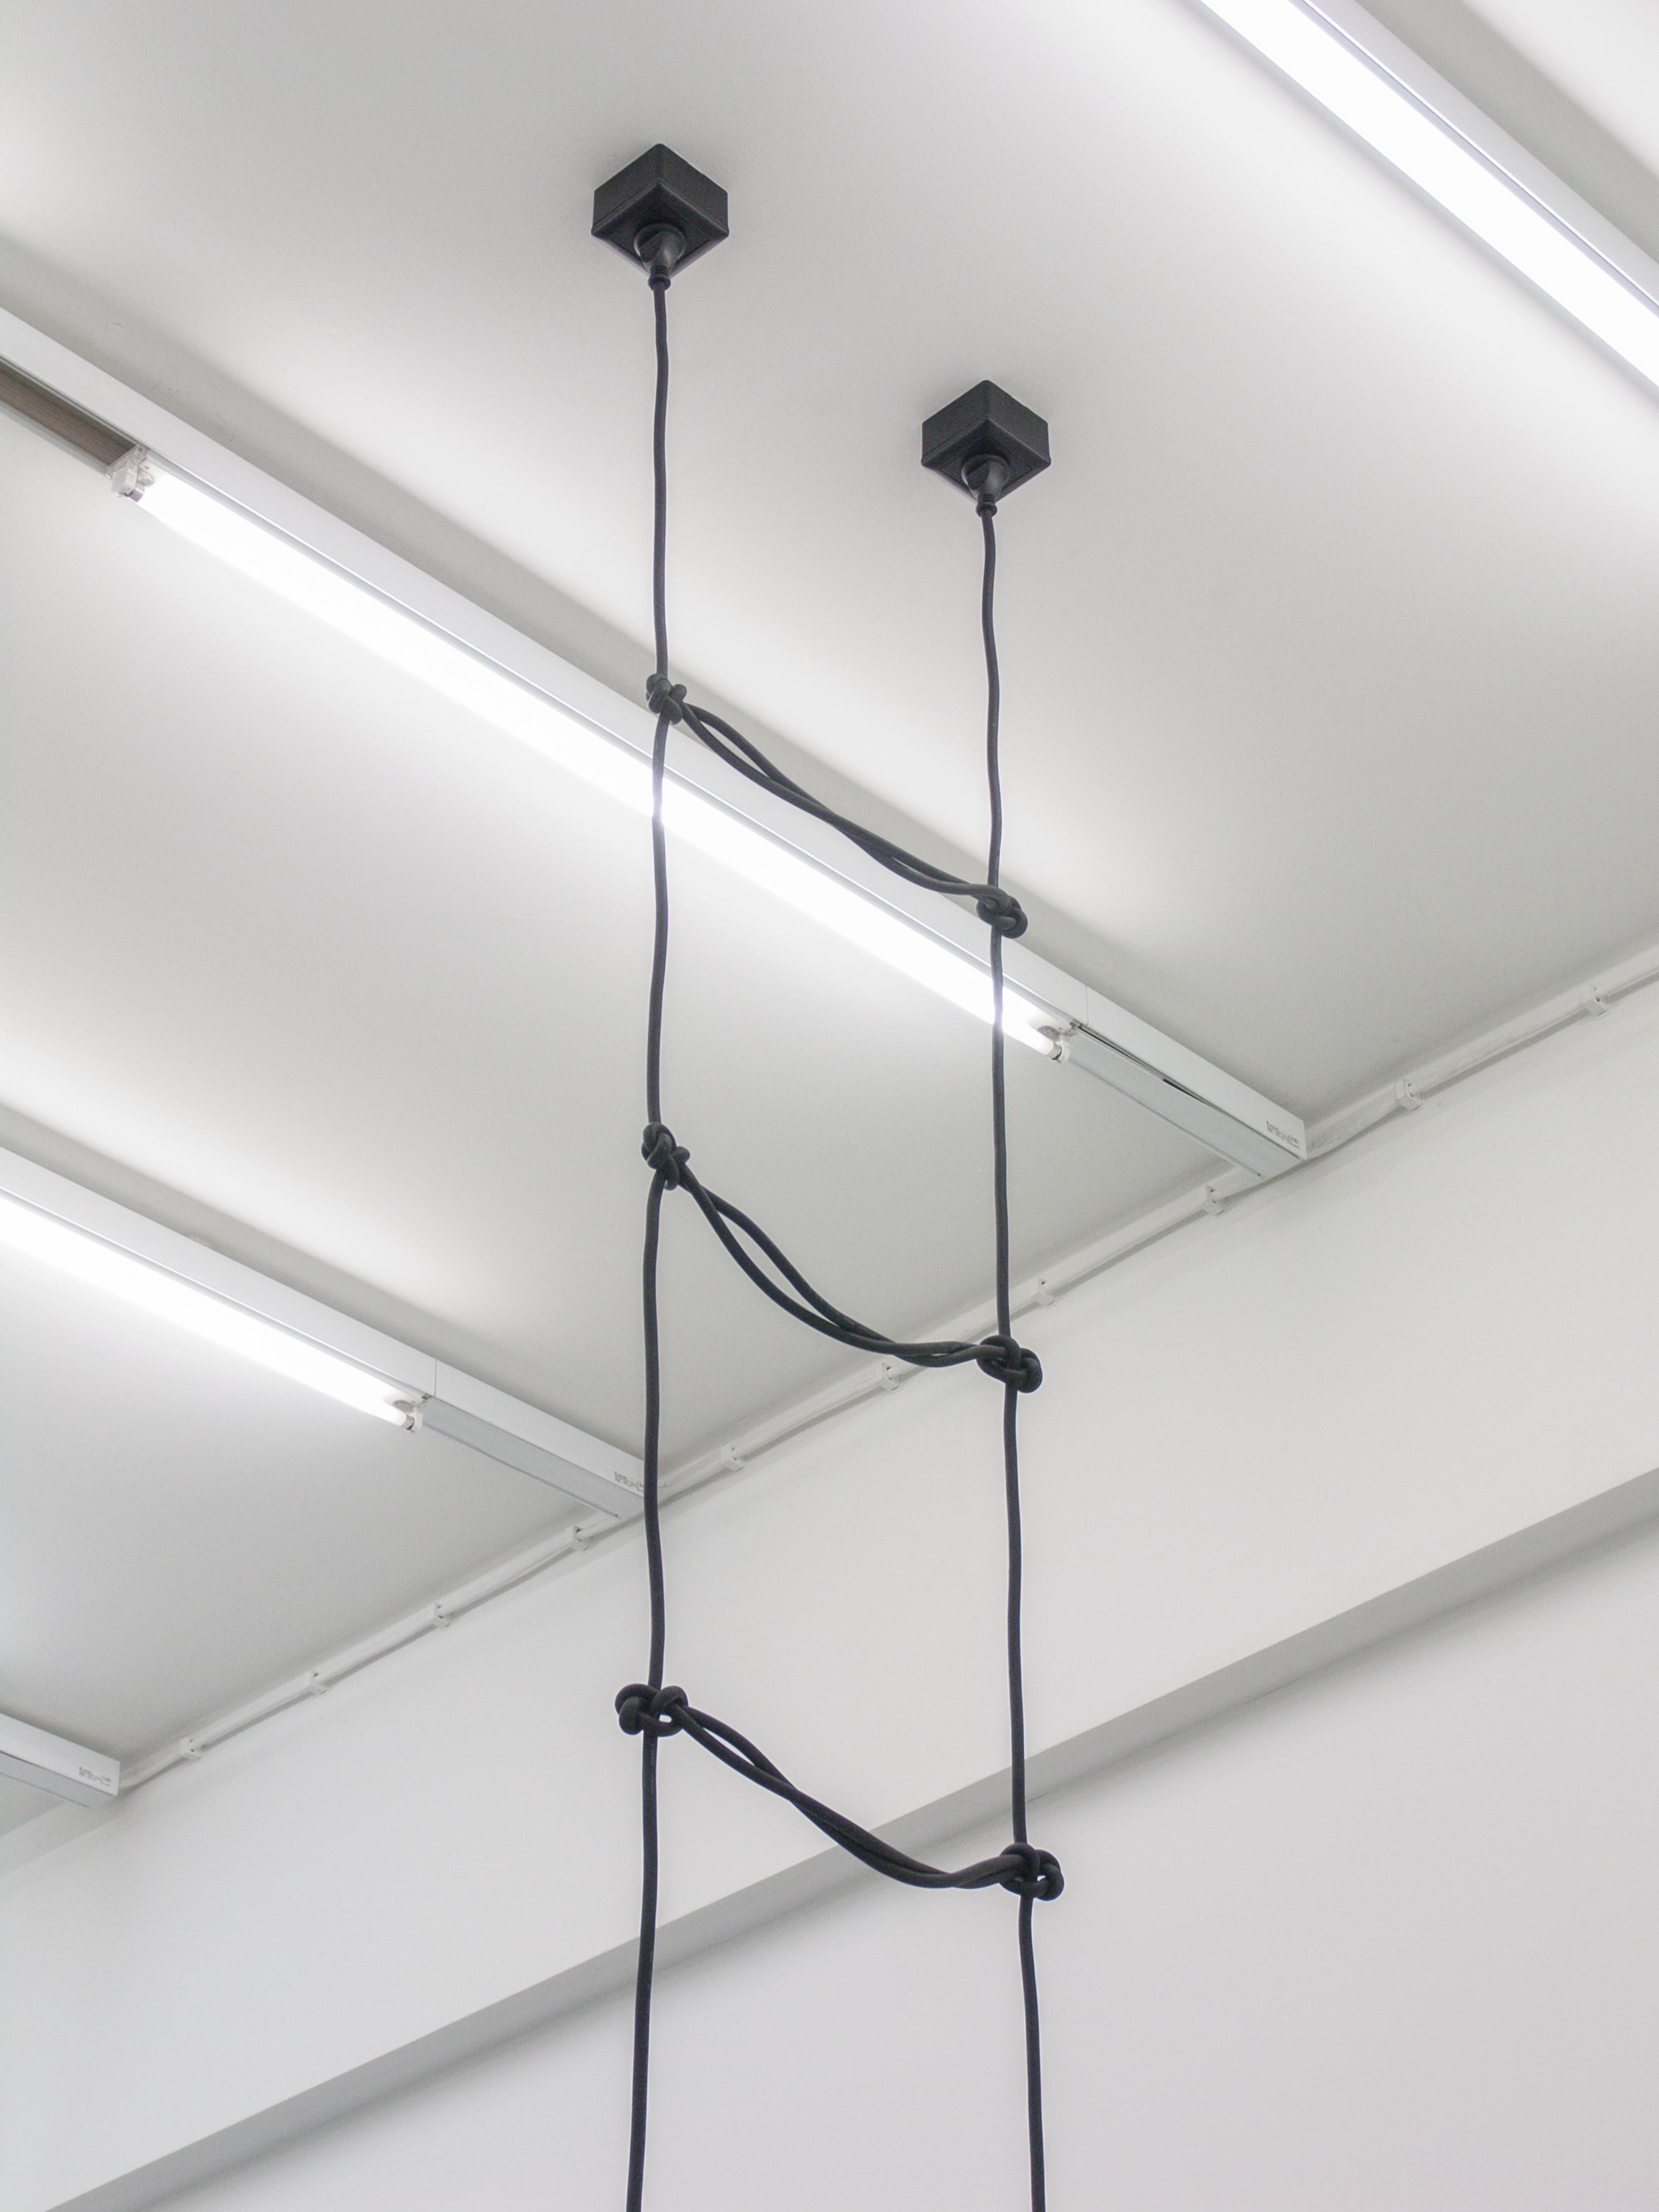 Artwork by Erik Andersen - Leiter 2010 - Black sculpture - Dimension variable - Installation View - Detail